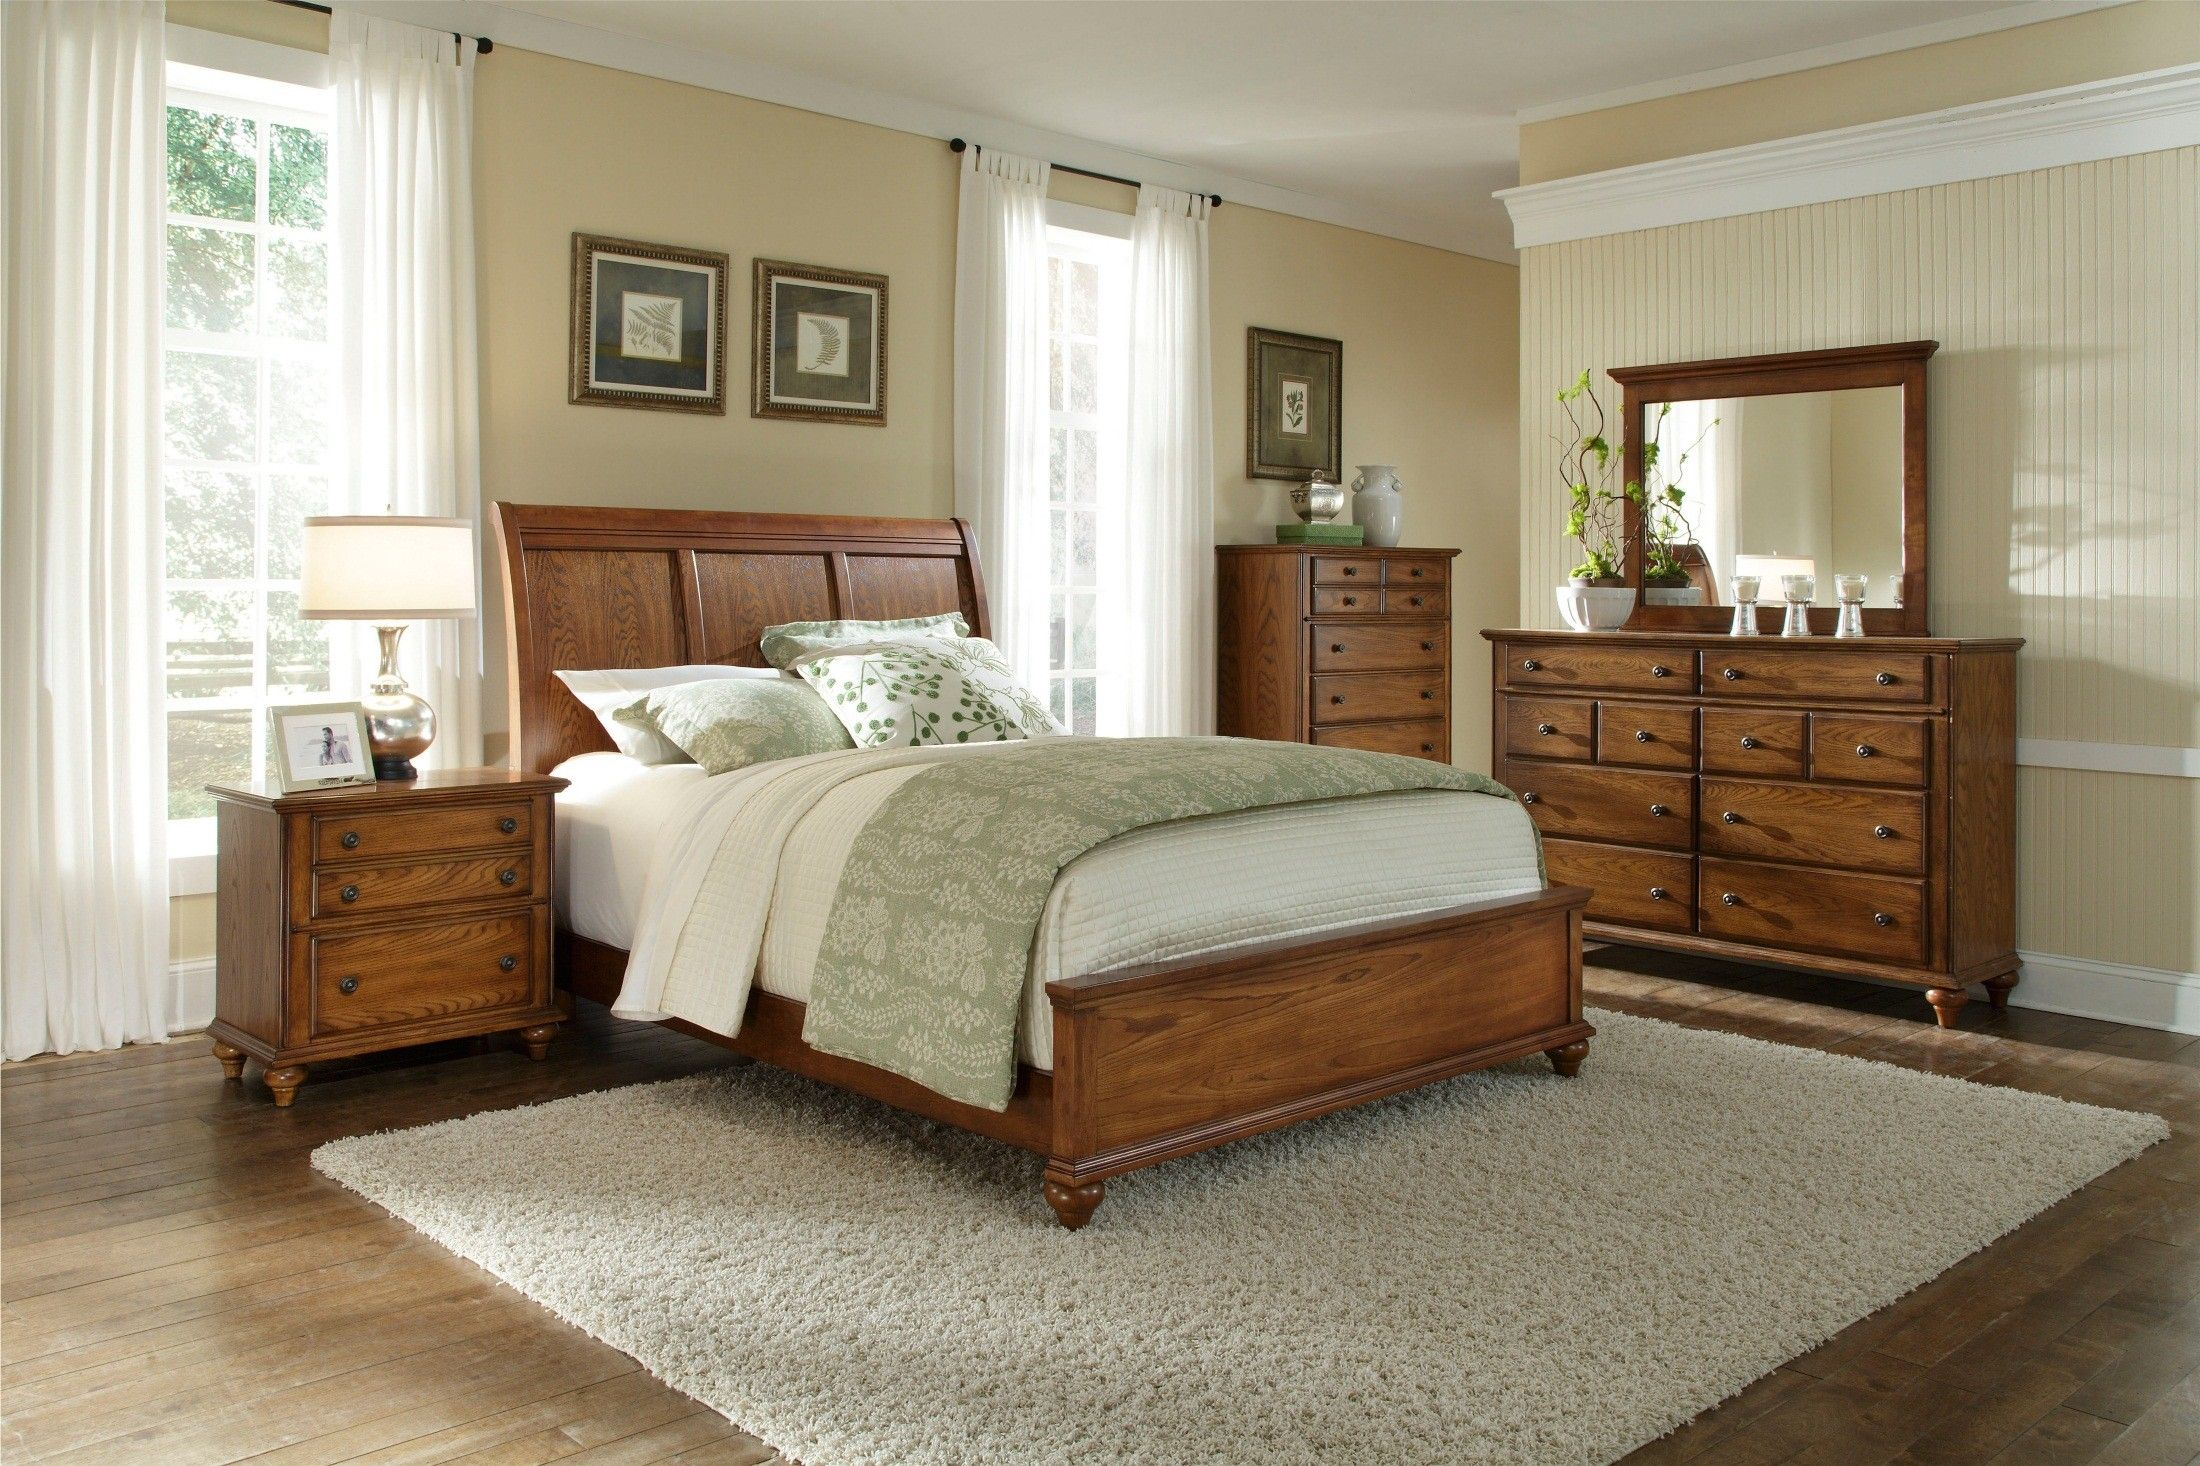 Master bedroom furniture sets  Hayden Place Oak Sleigh Bedroom Set  Indoor Home WishesDecor